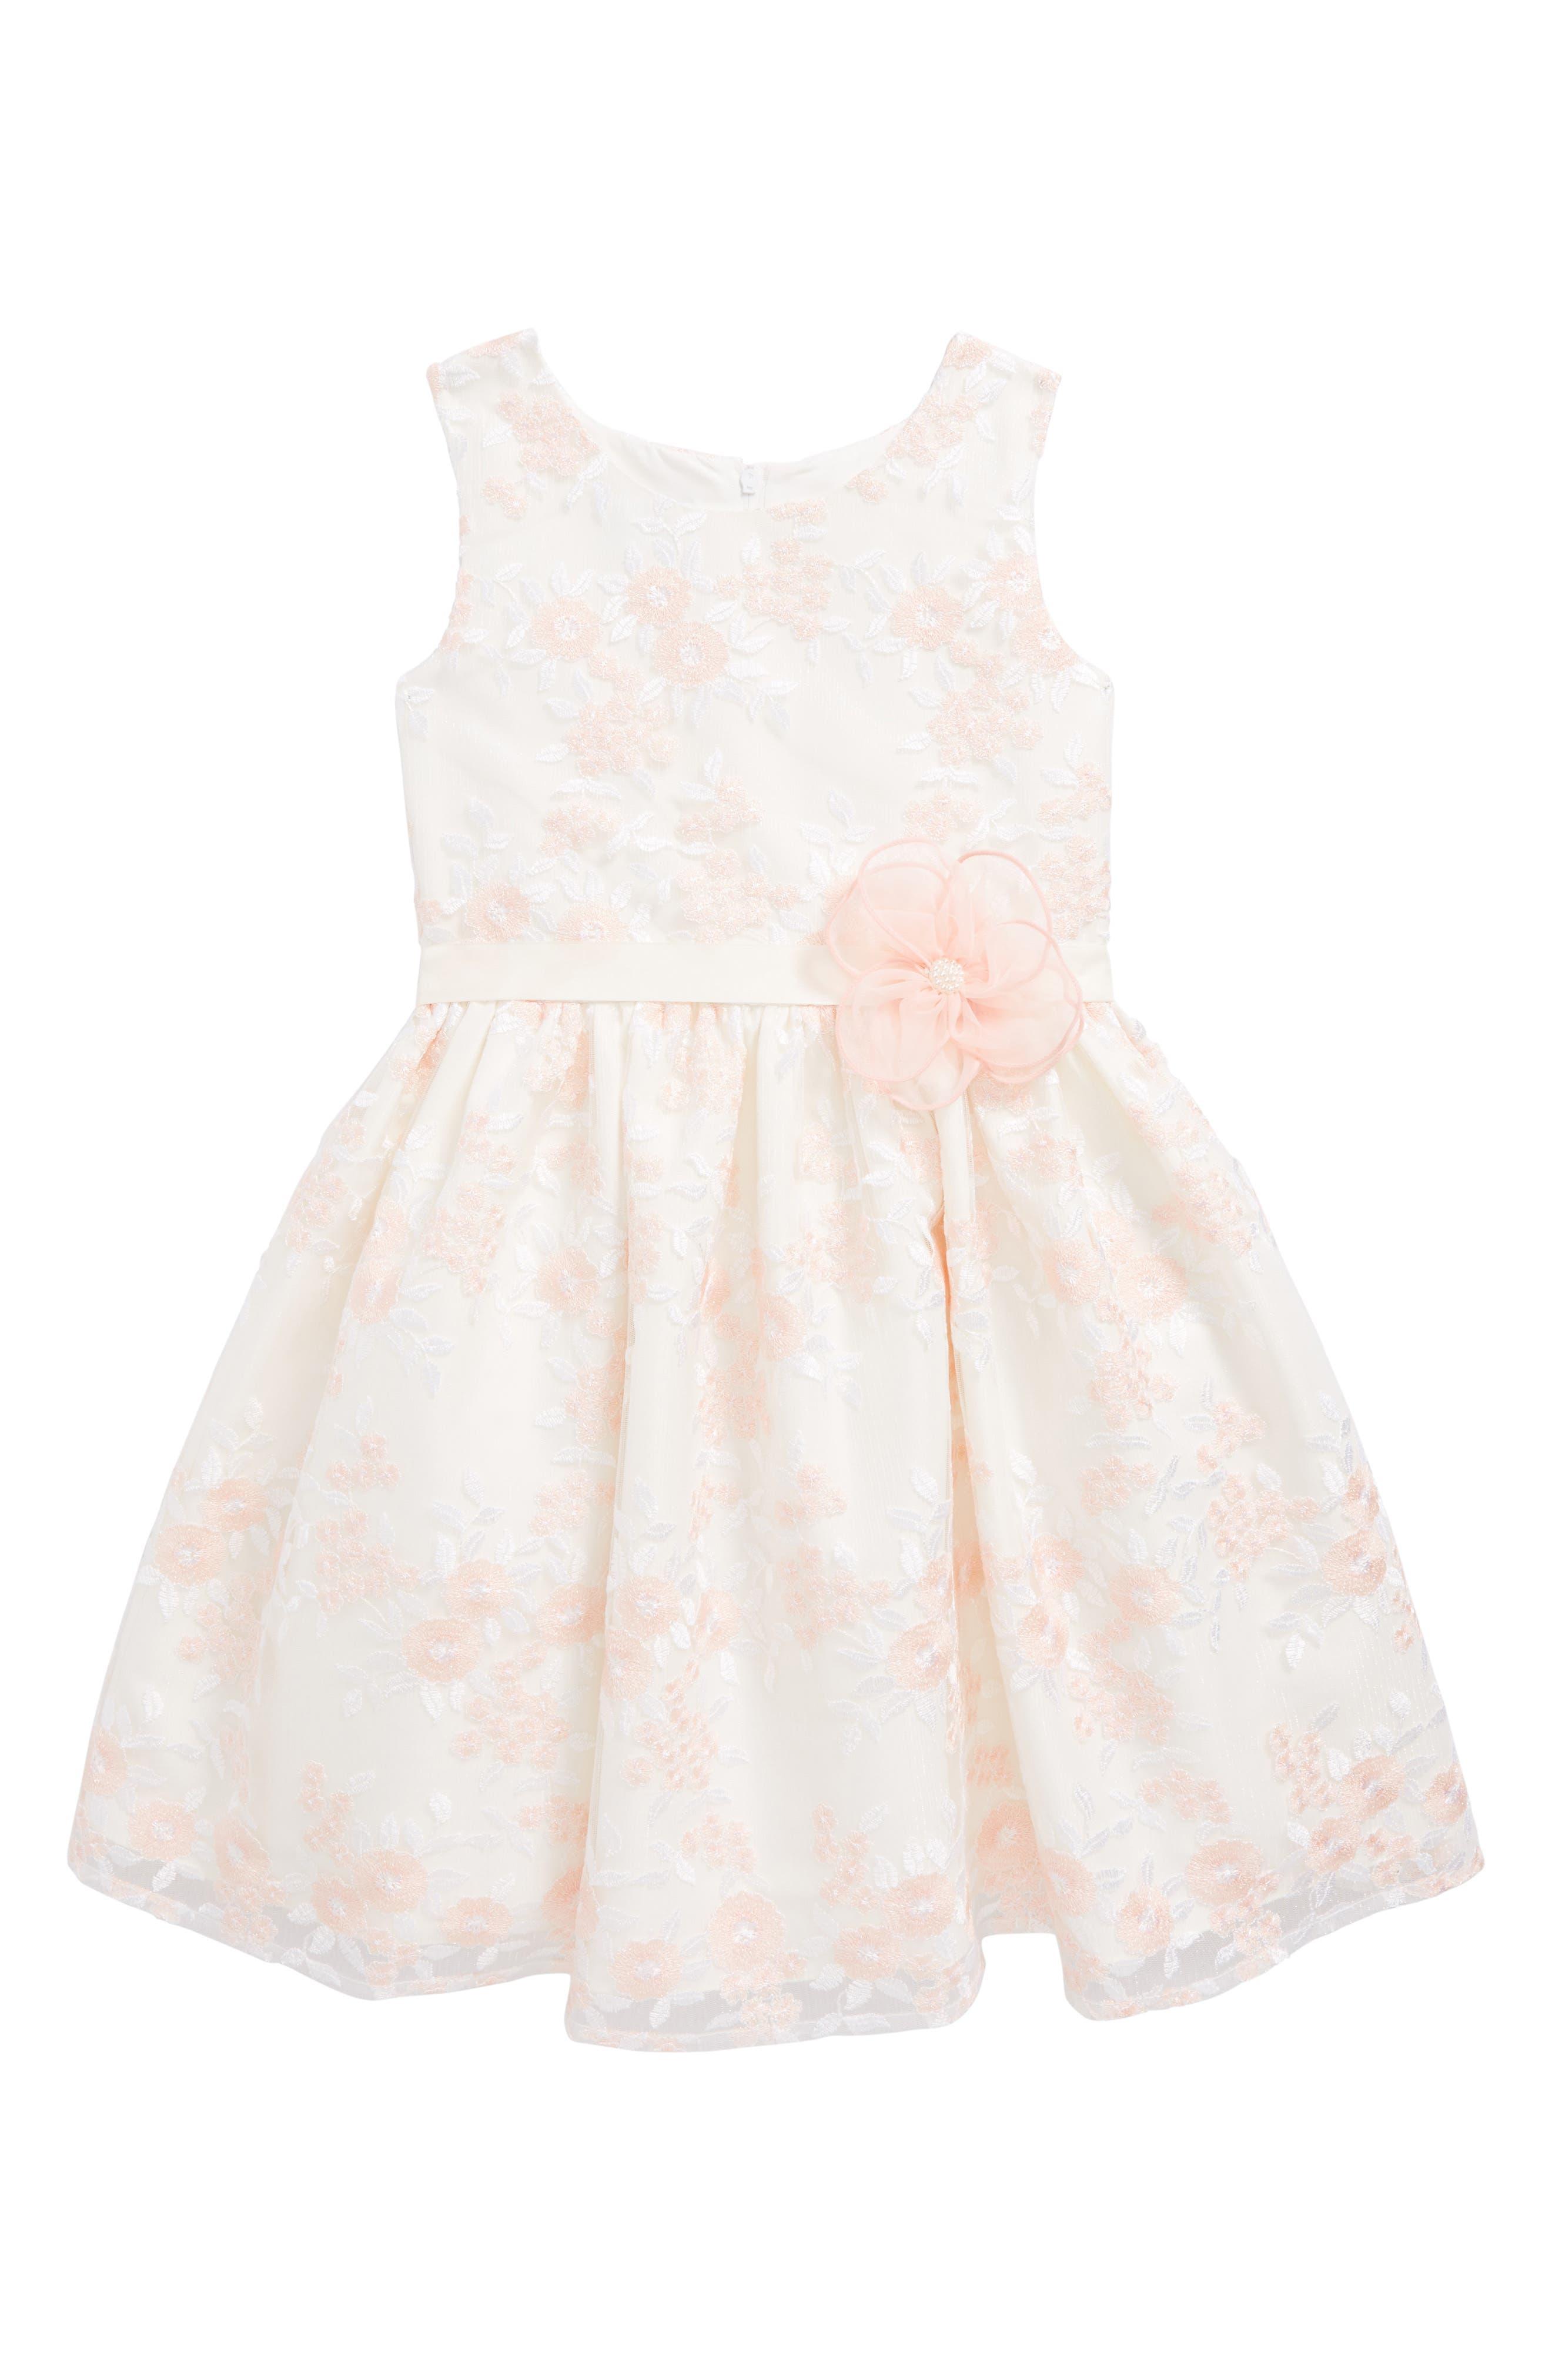 Frais Embroidered Tulle Dress (Toddler Girls, Little Girls & Big Girls)